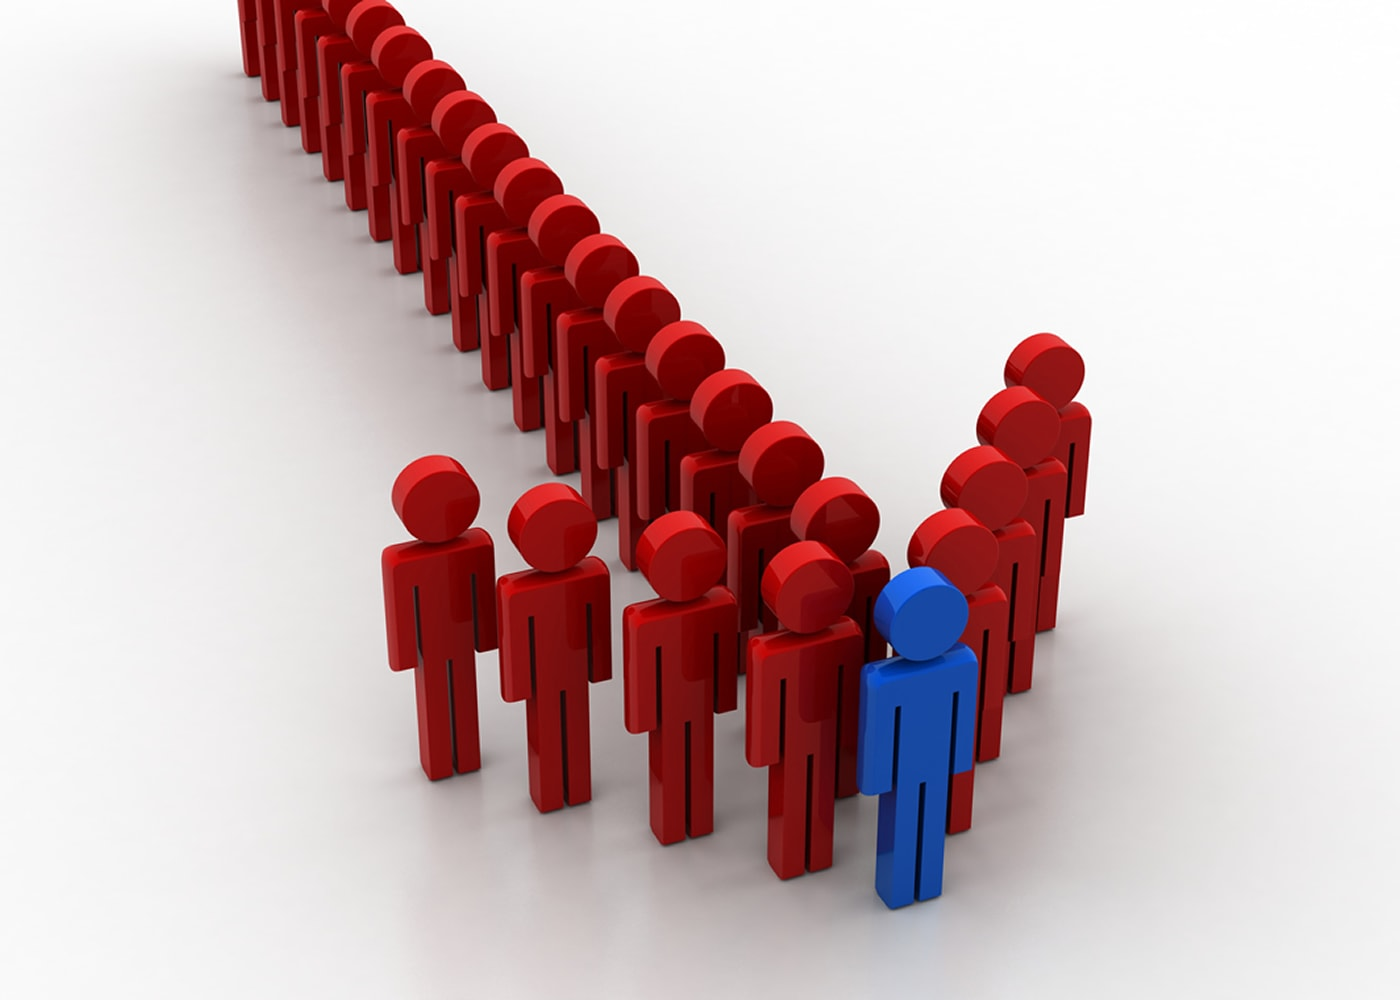 naem-webinar-2017-leadership-webinar-series-the-business-case-for-having-a-strong-personal-brand-700x500